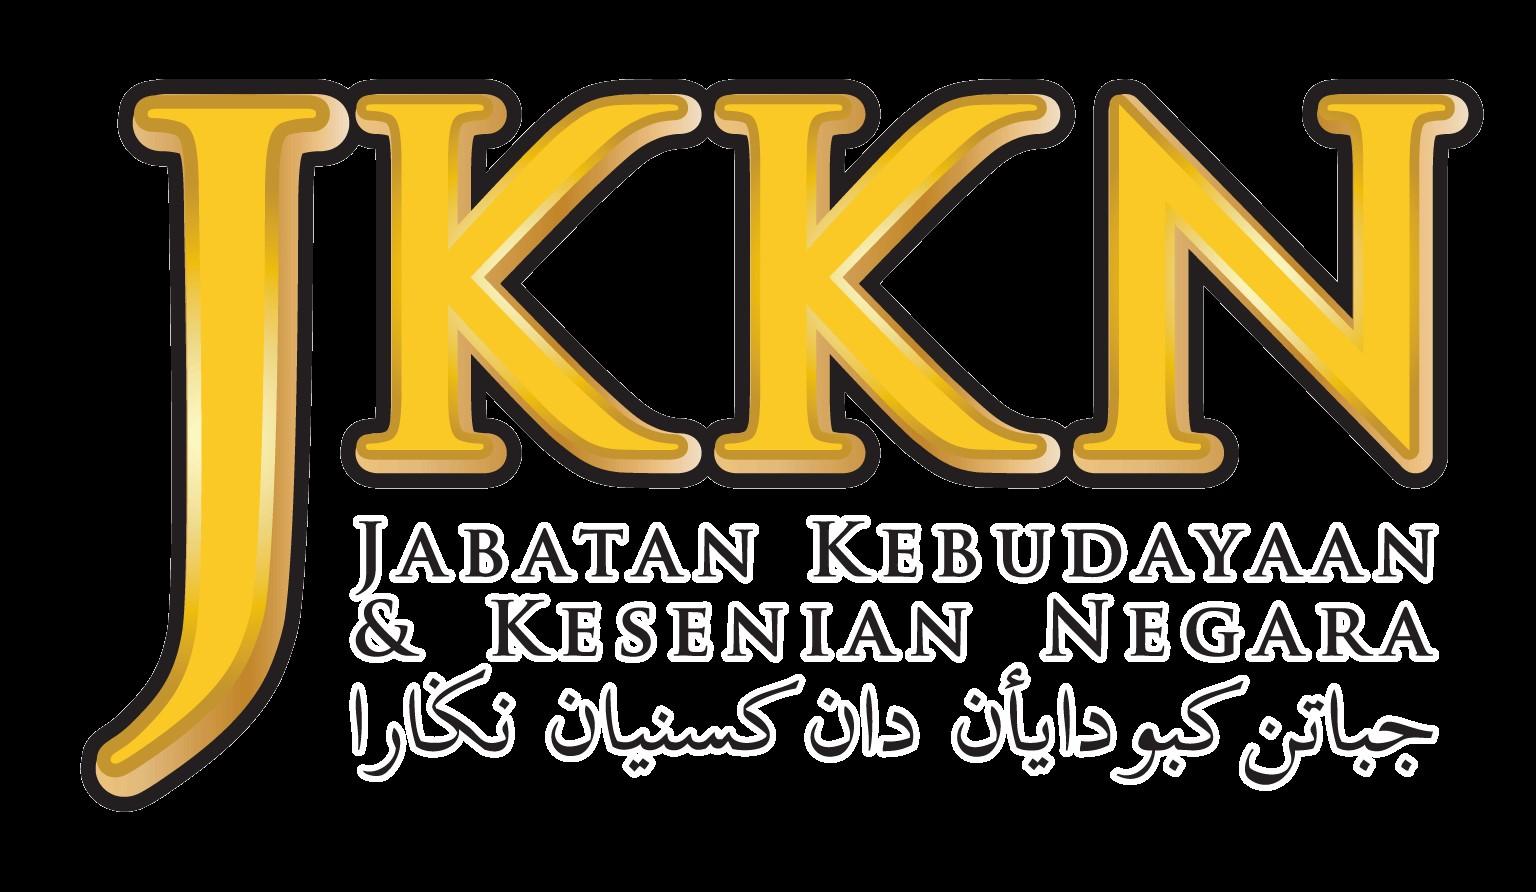 JKKN logo, low res.jpg